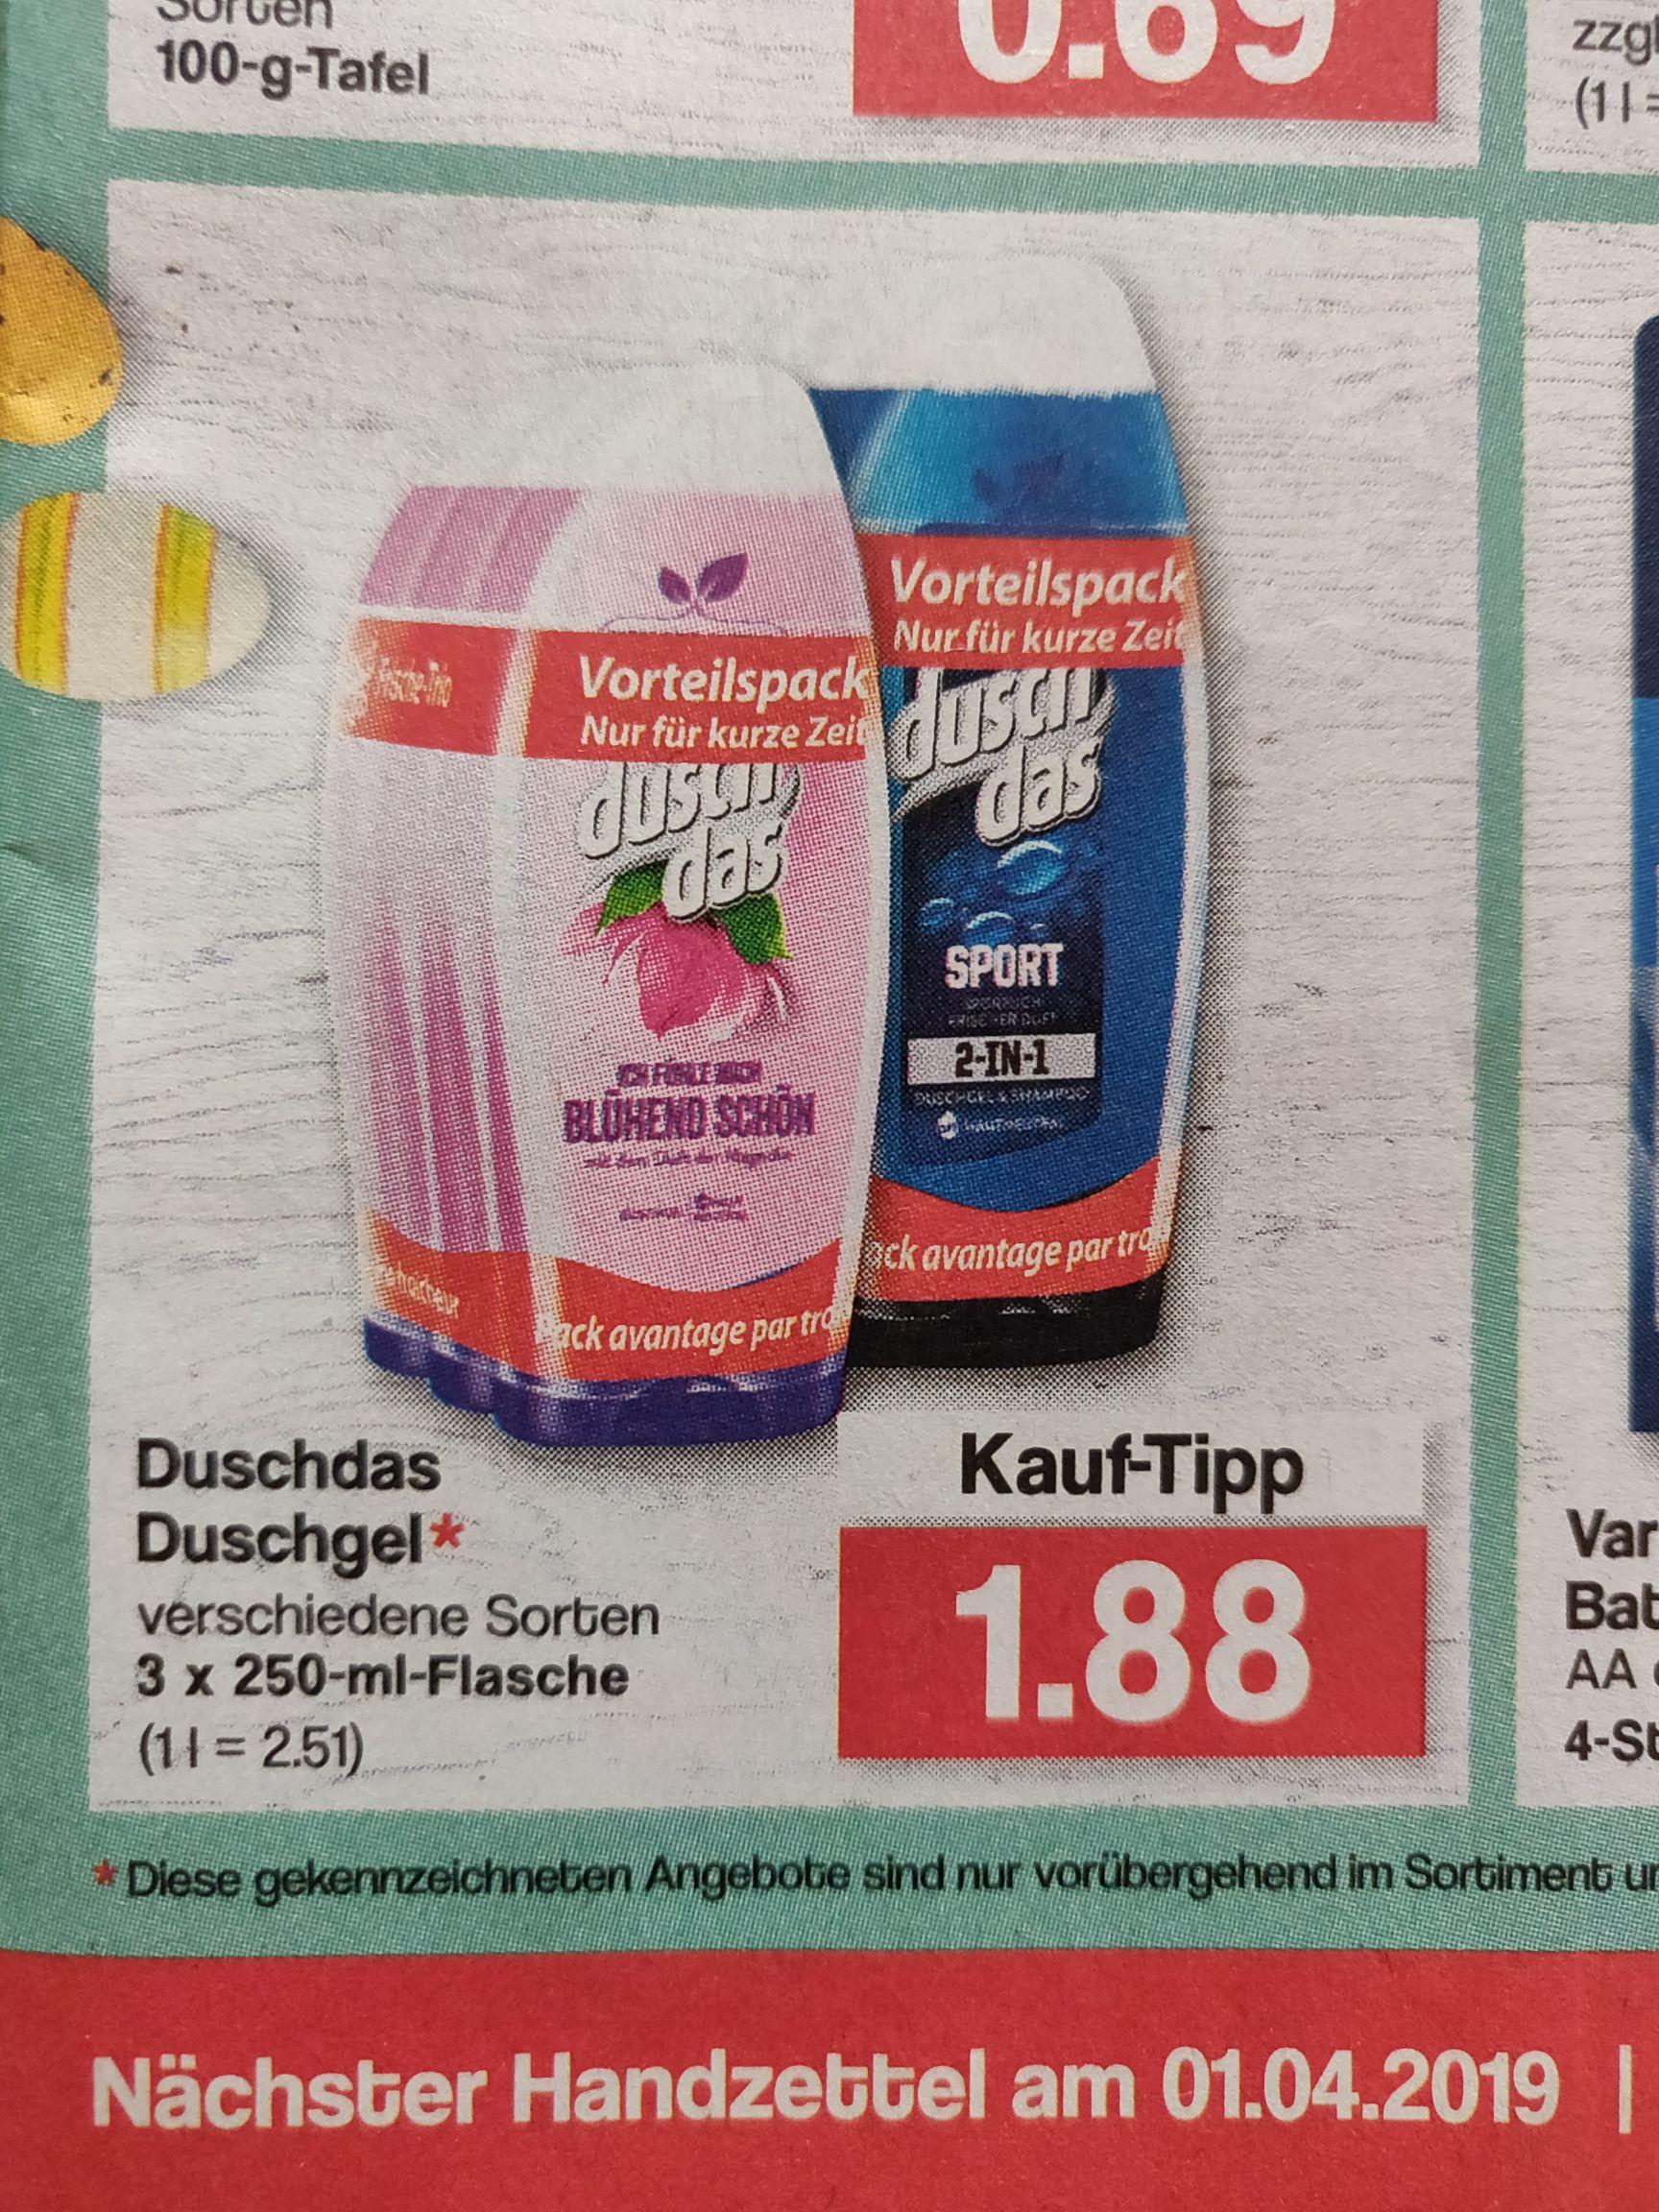 [Famila] 3 x Duschdas Duschgel versch. Sorten für 1,88 €